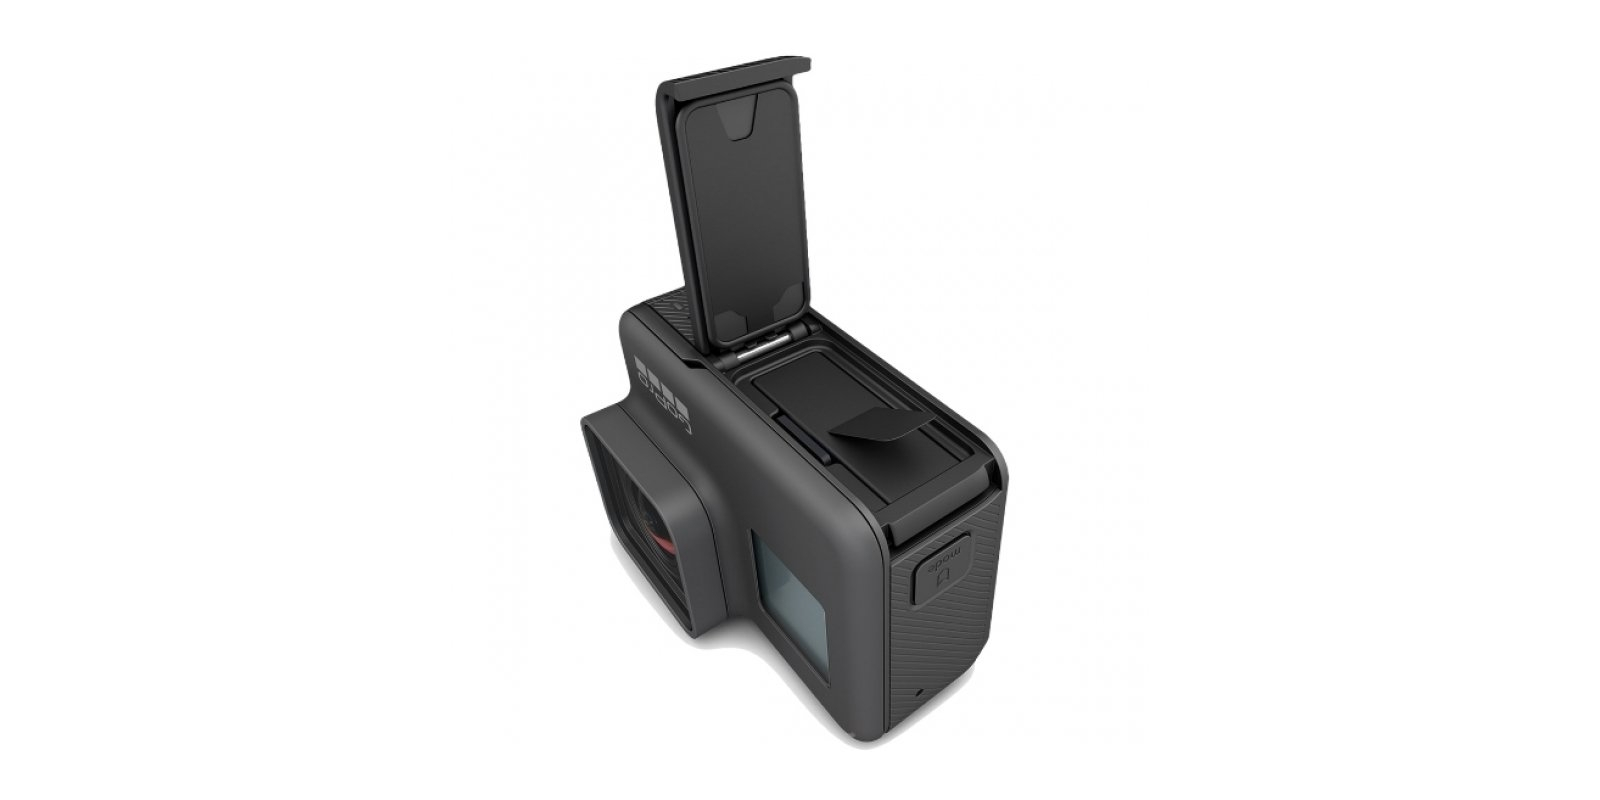 Литий-ионный аккумулятор GoPro Rechargeable Battery HERO6 и HERO5 Black (без упаковки) в камере